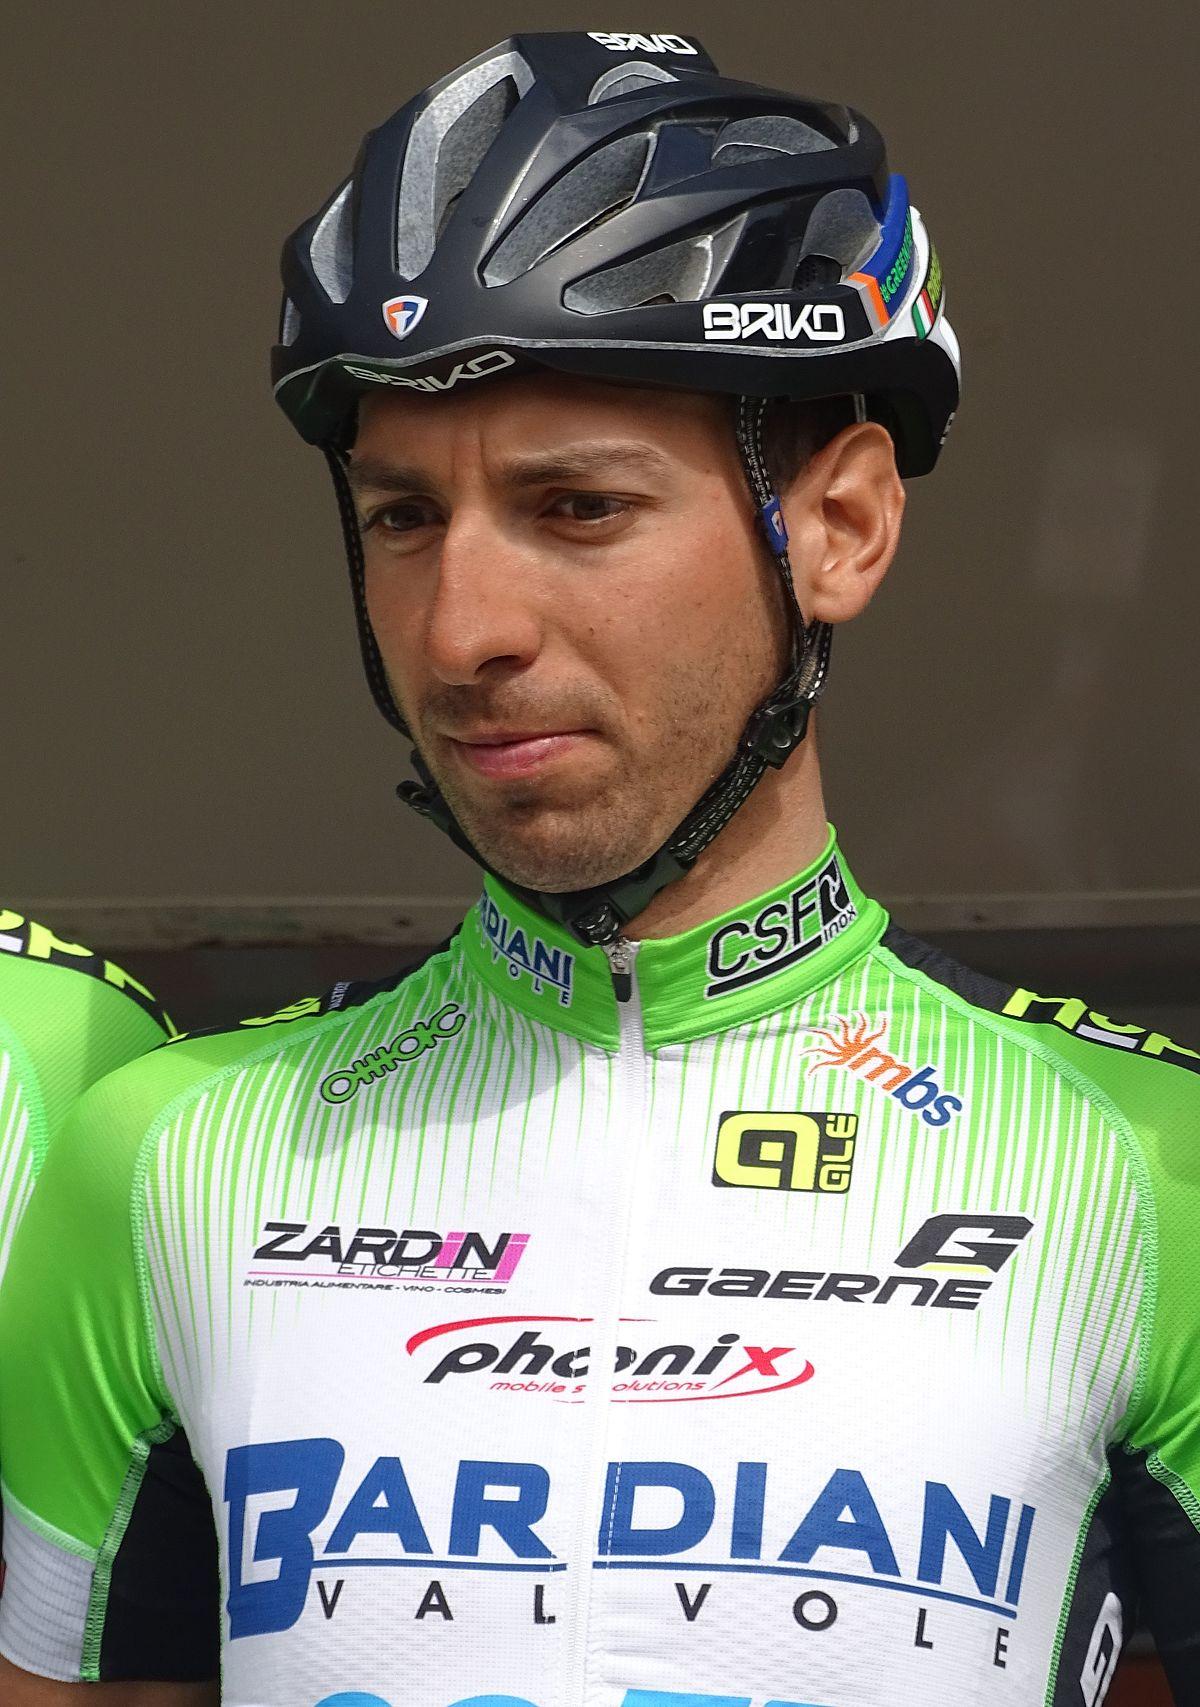 Stefano Pirazzi - Wikipedia